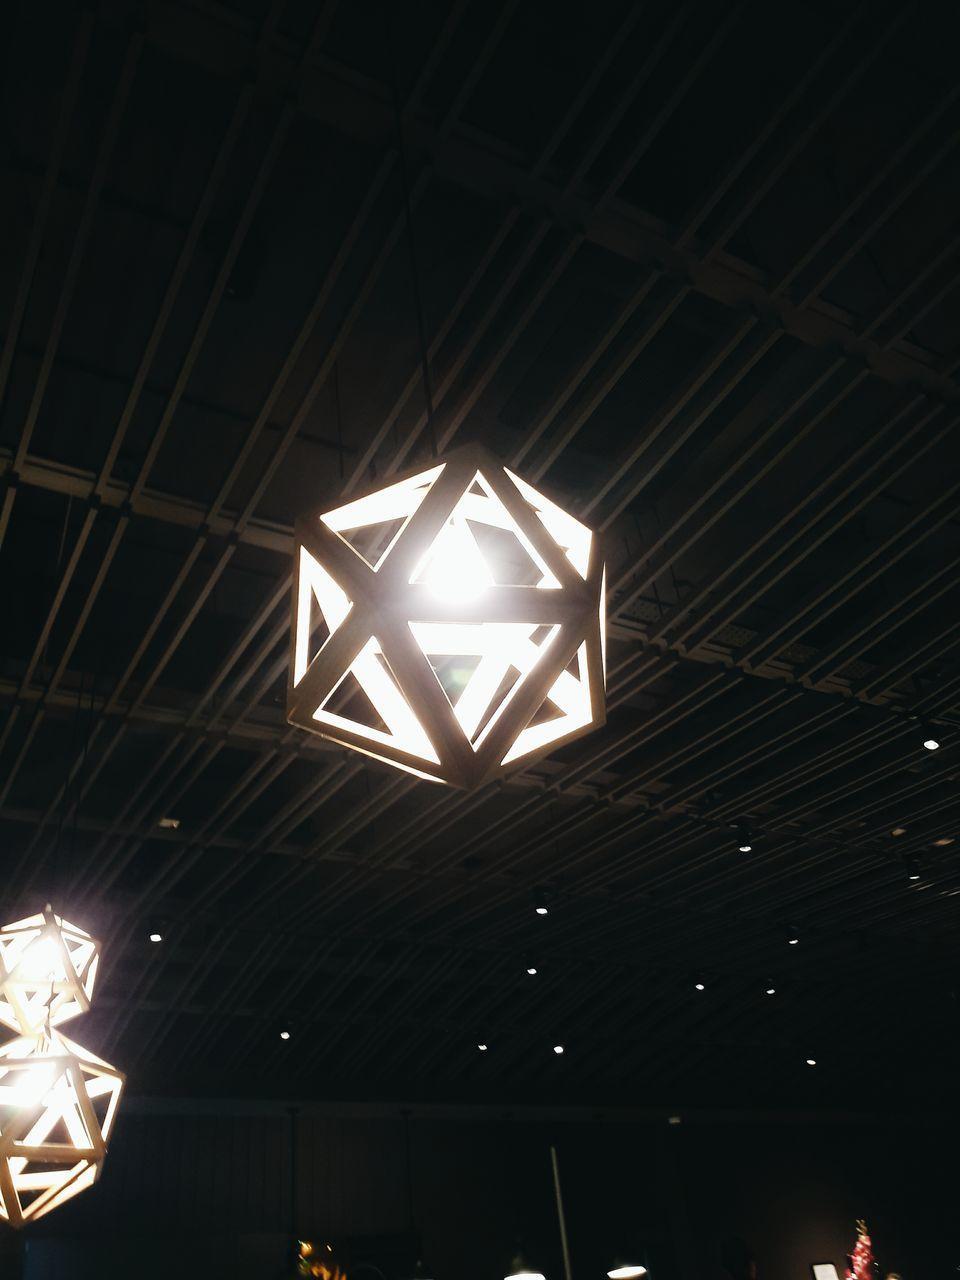 illuminated, lighting equipment, low angle view, no people, pattern, night, indoors